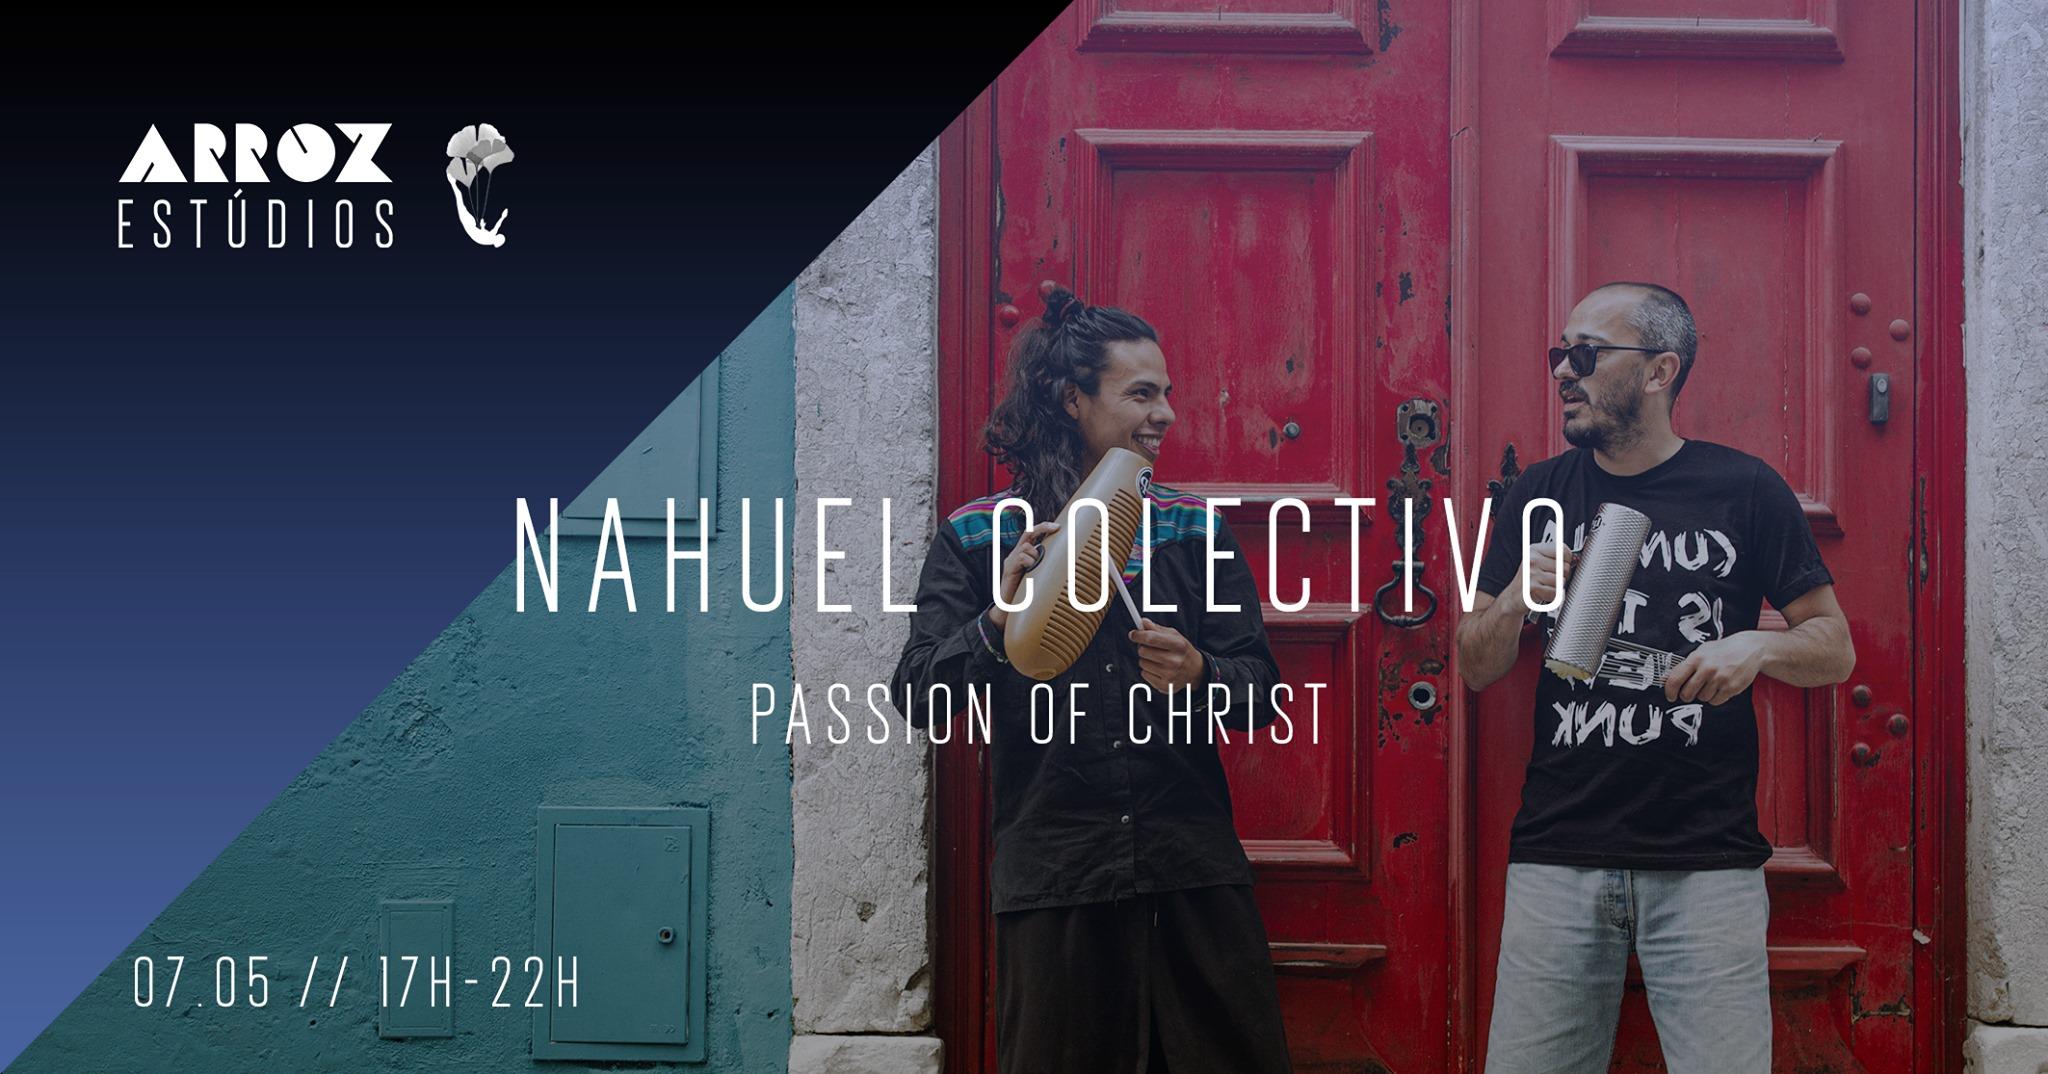 Nahuel Colectivo - Passion of Christ